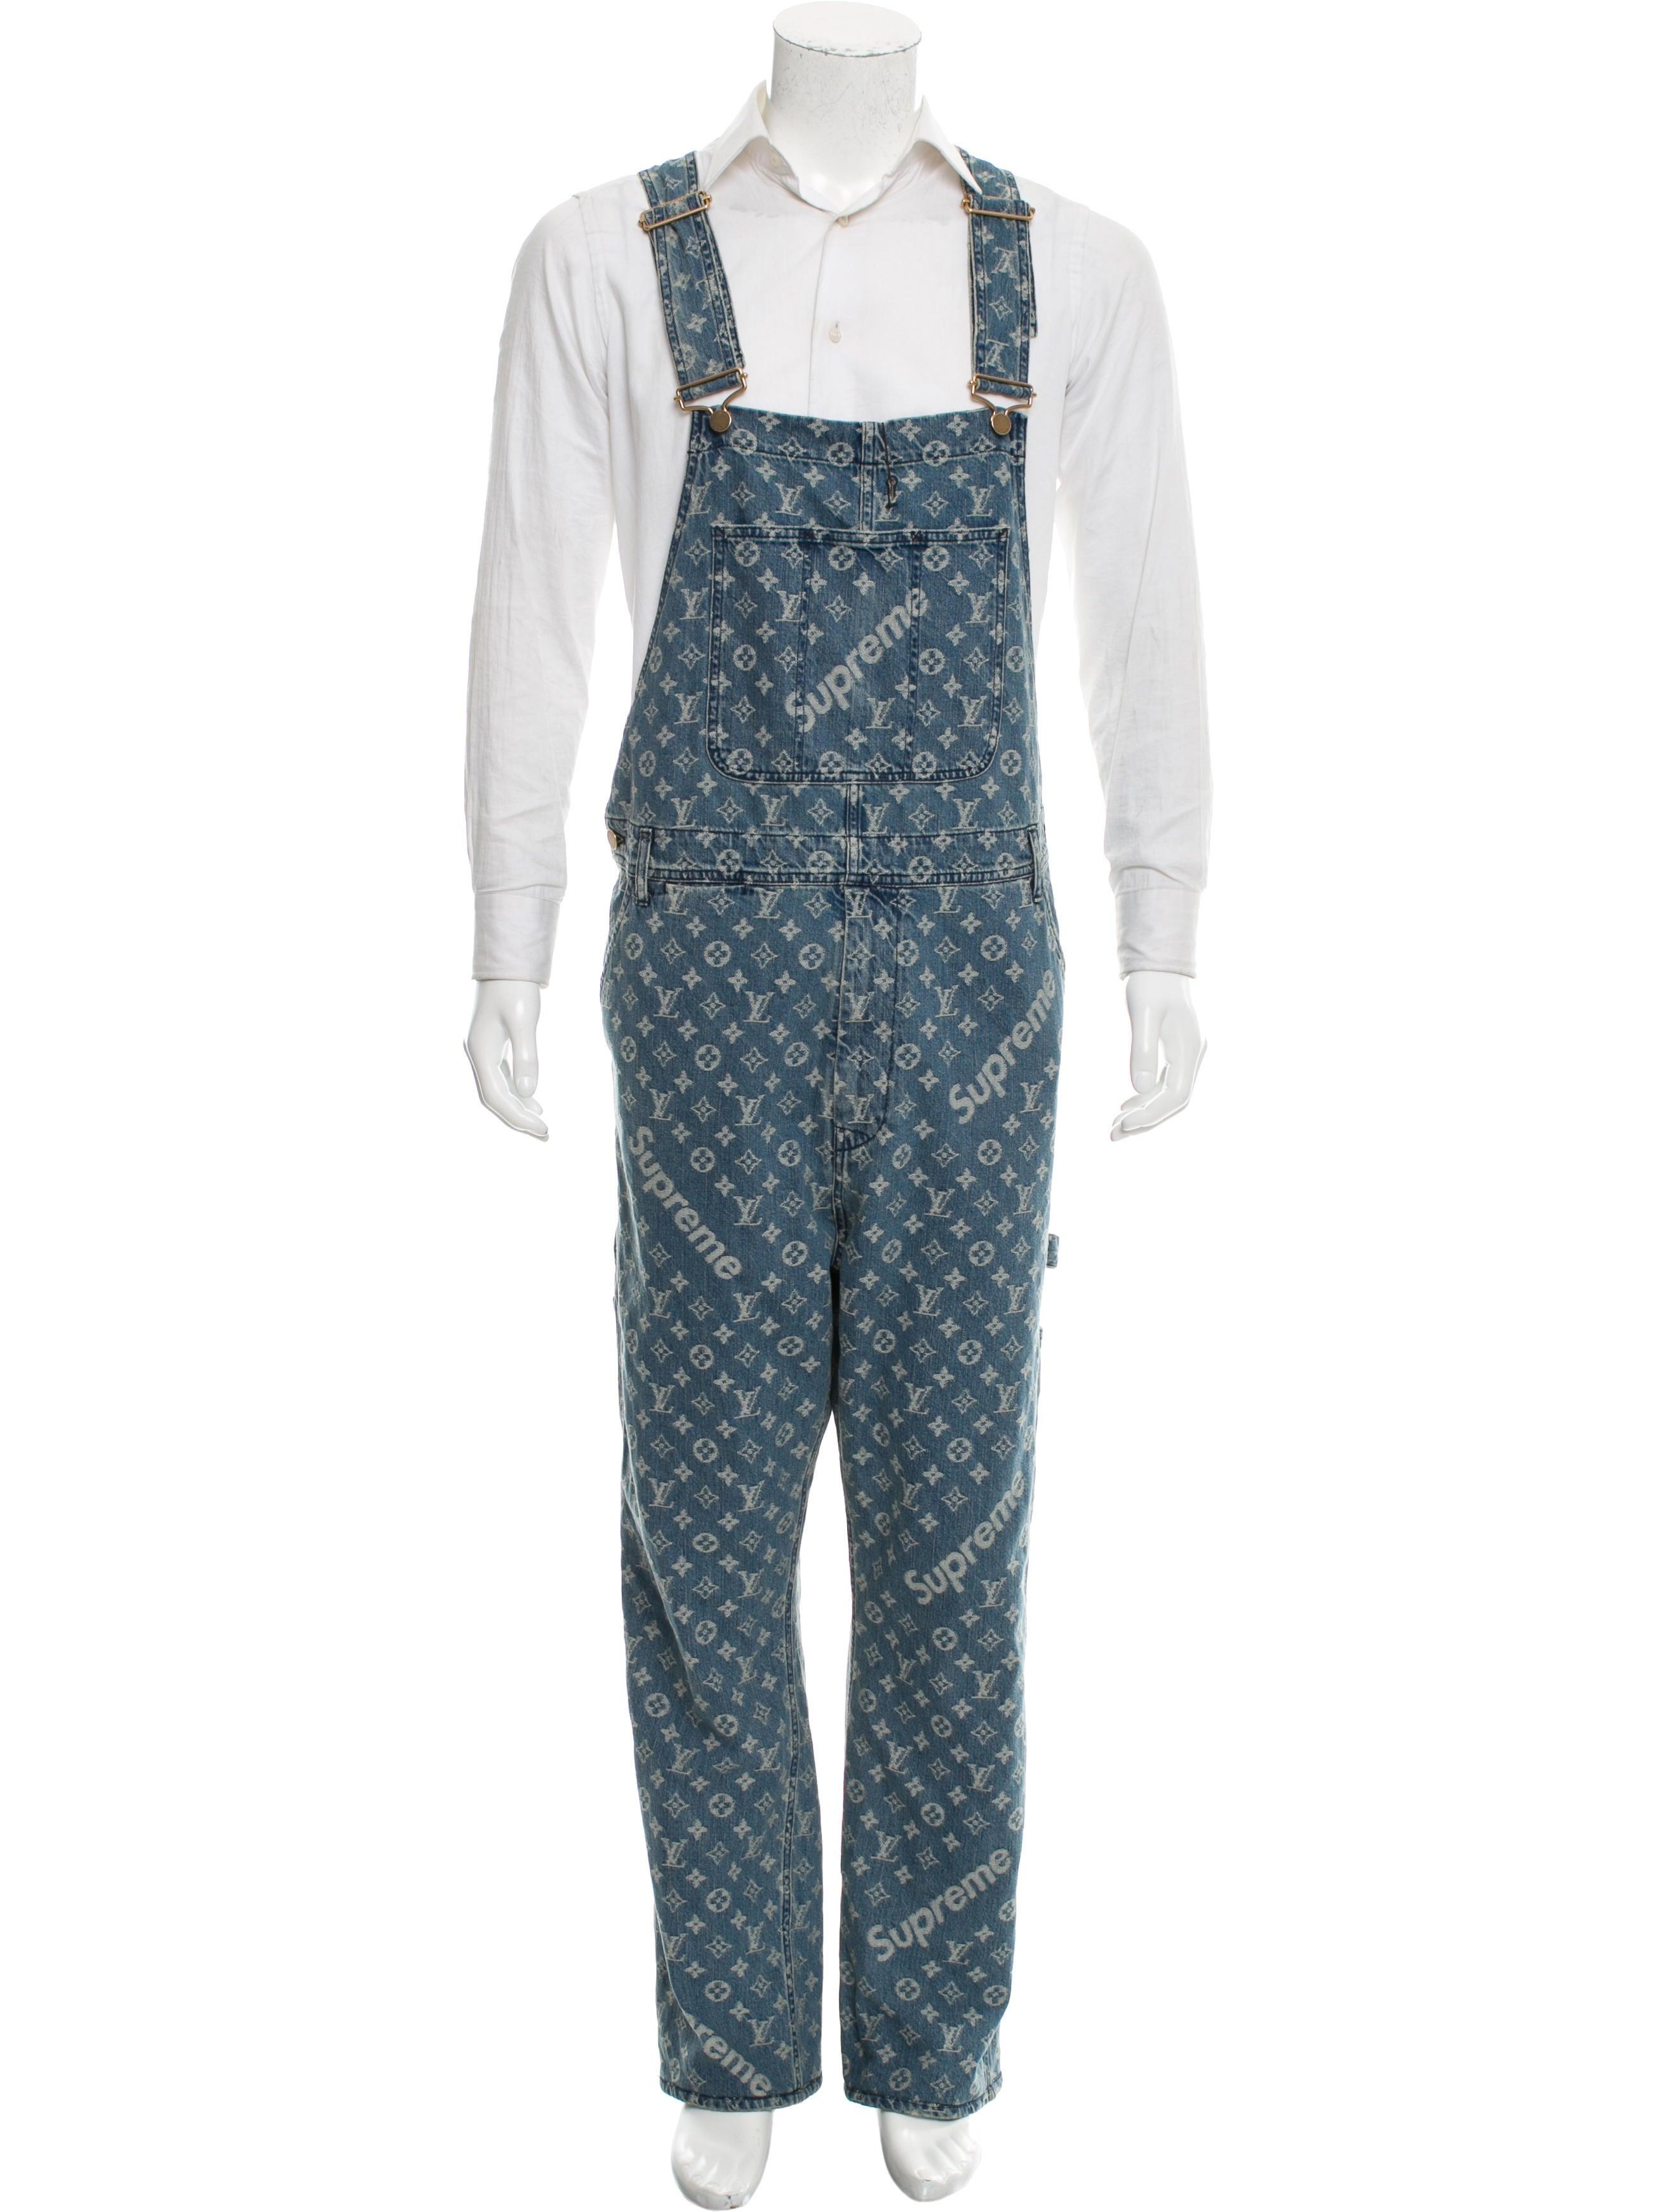 ec3f5558332 Louis Vuitton x Supreme 2017 Jacquard Denim Overalls w/ Tags ...